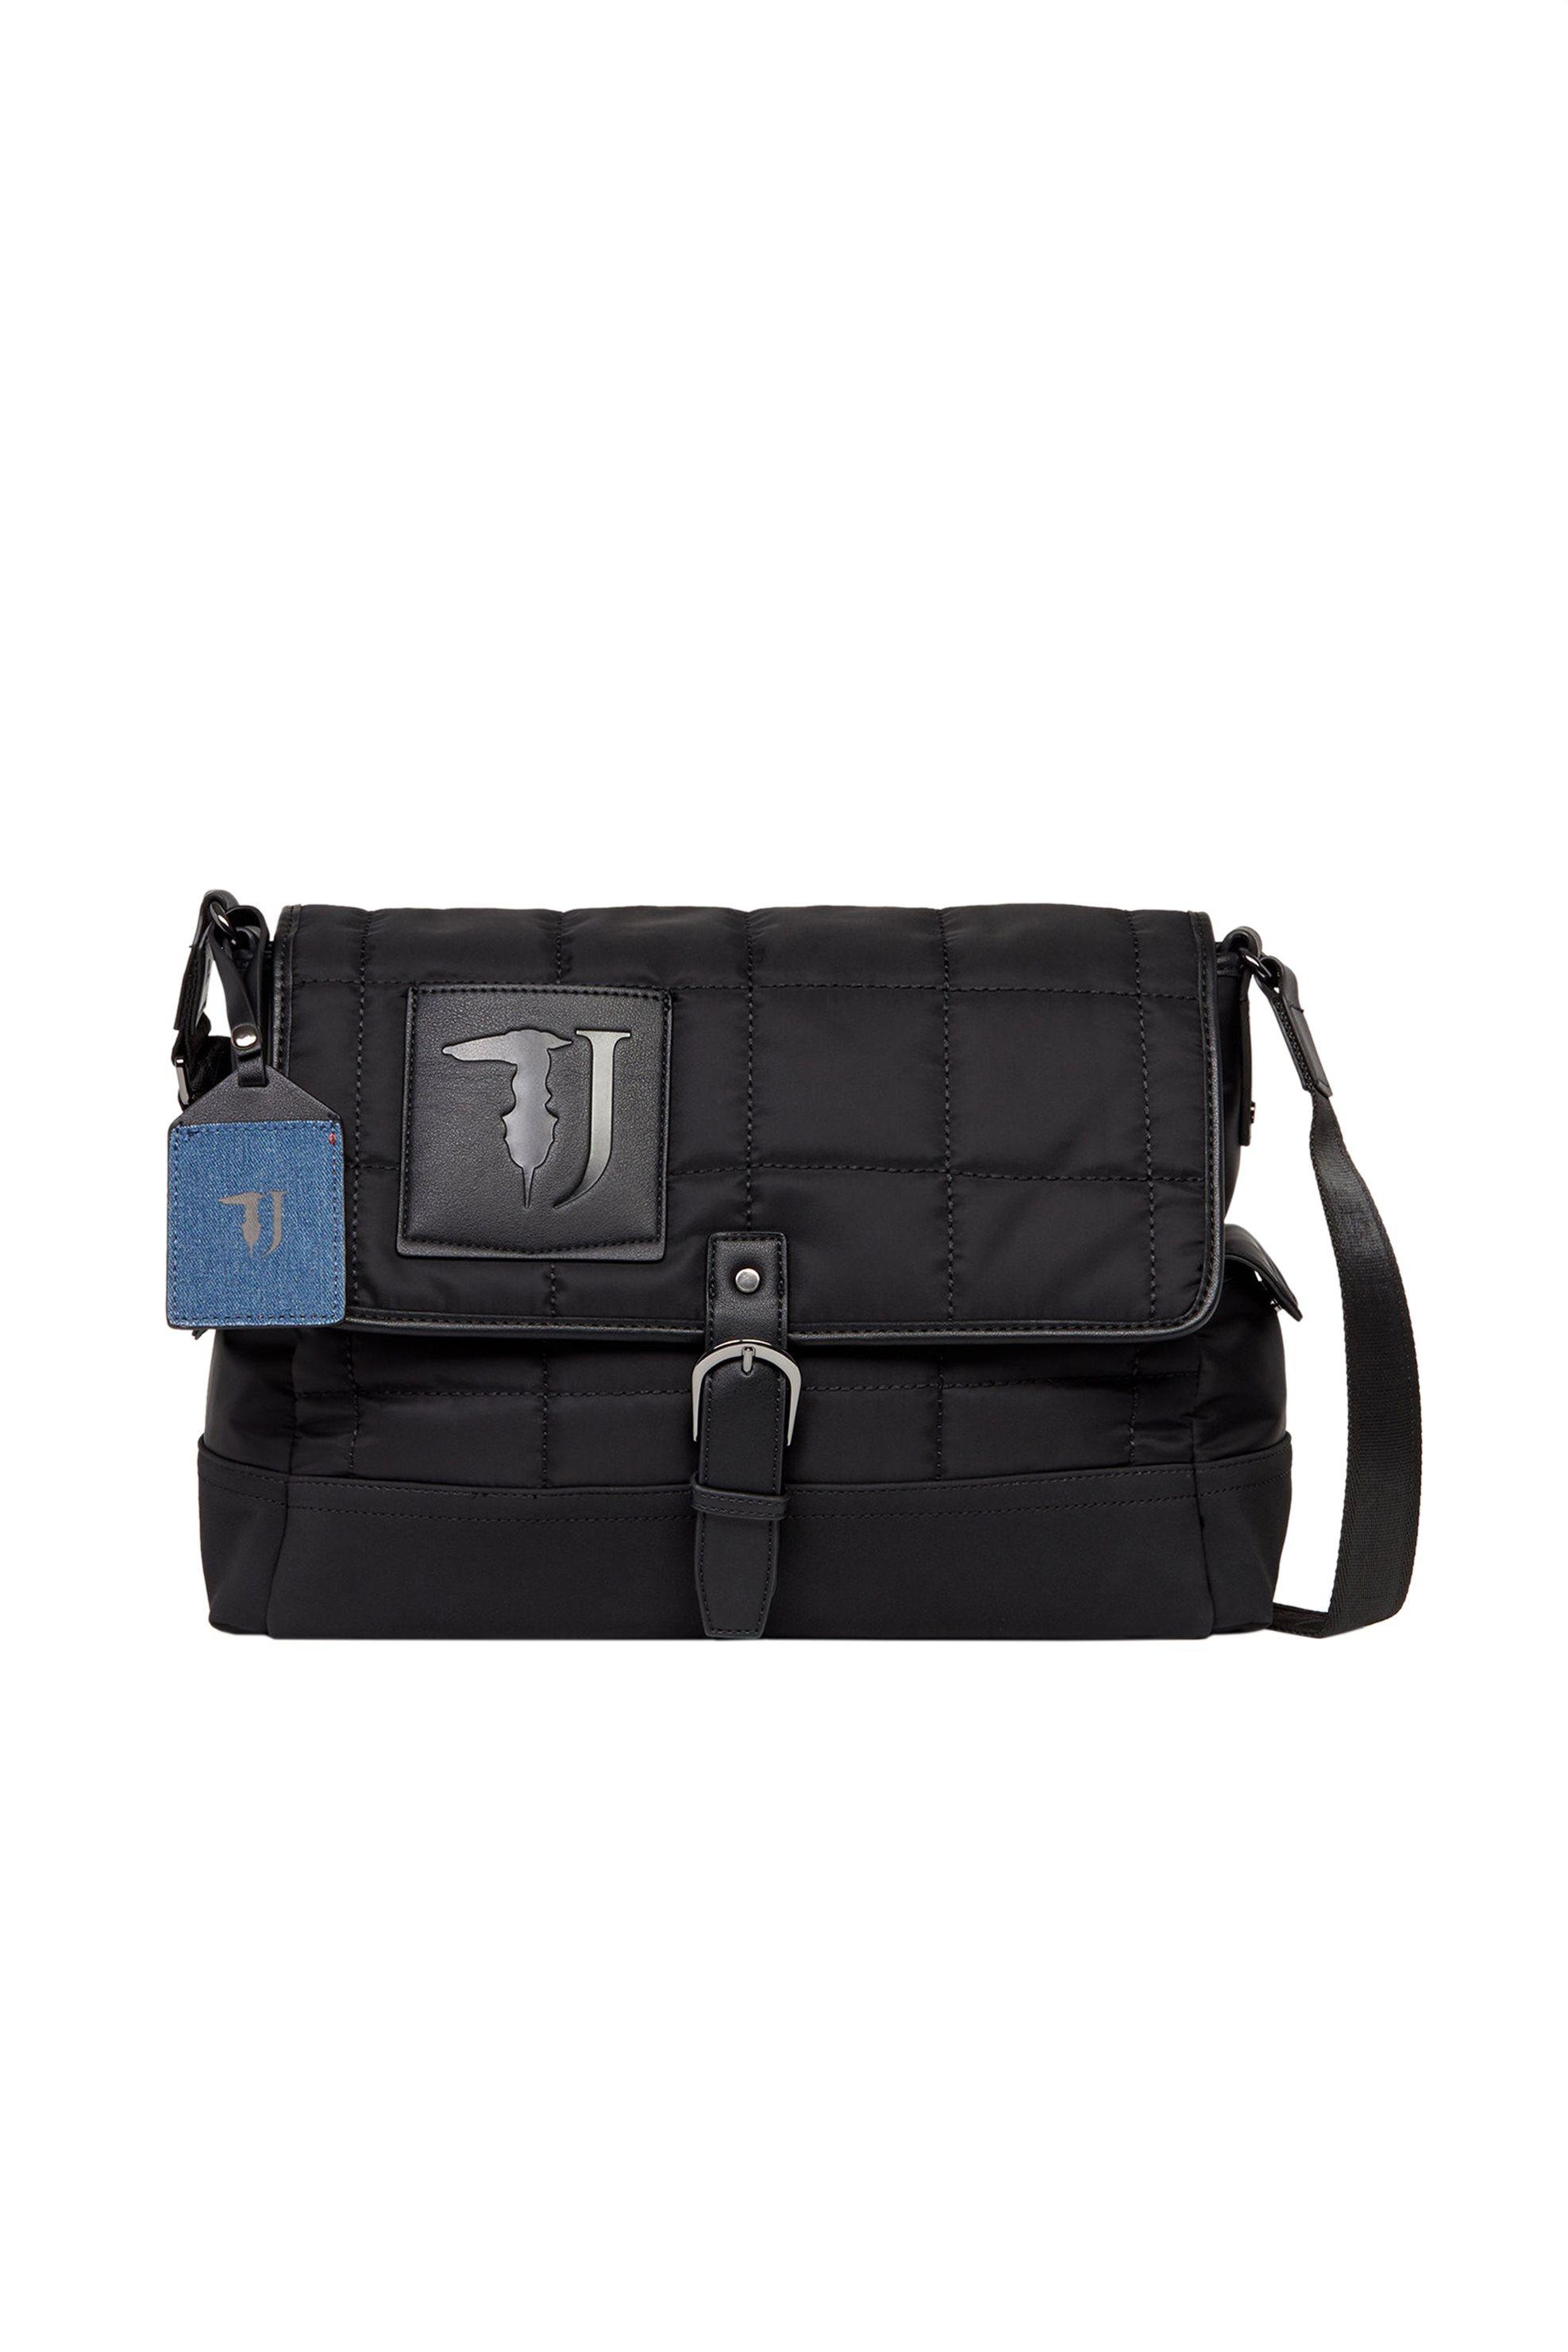 Trussardi Jeans ανδρική messenger bag Ticinese - 71B00099-9Y099999 - Μαύρο ανδρασ   τσαντεσ   τσάντες χειρός   laptop